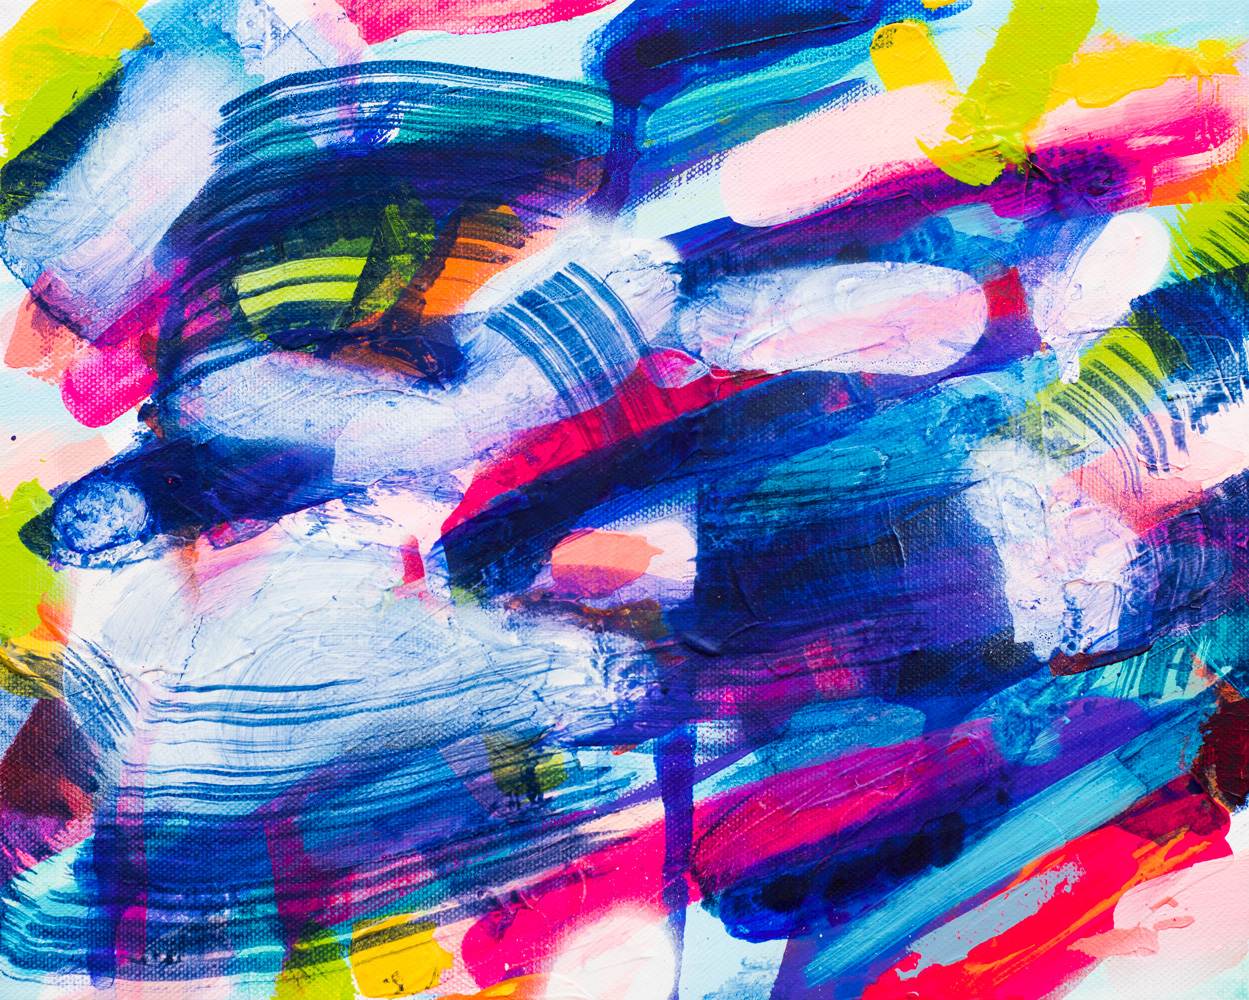 Zen Garden, 2016 / acrylics on canvas / 30x24 cm / available 150 €